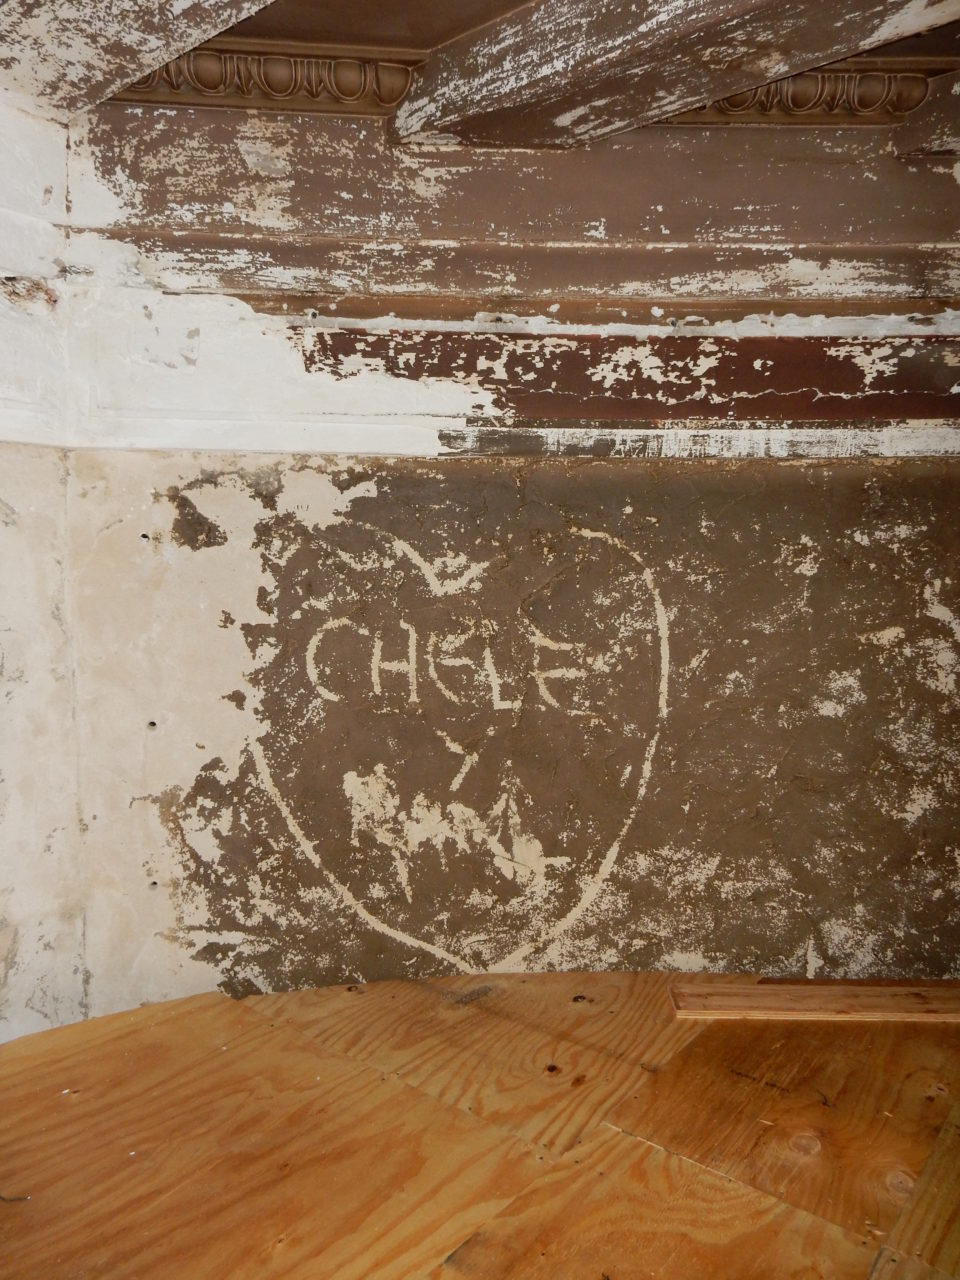 Graffiti etched into the Theatre's plaster walls